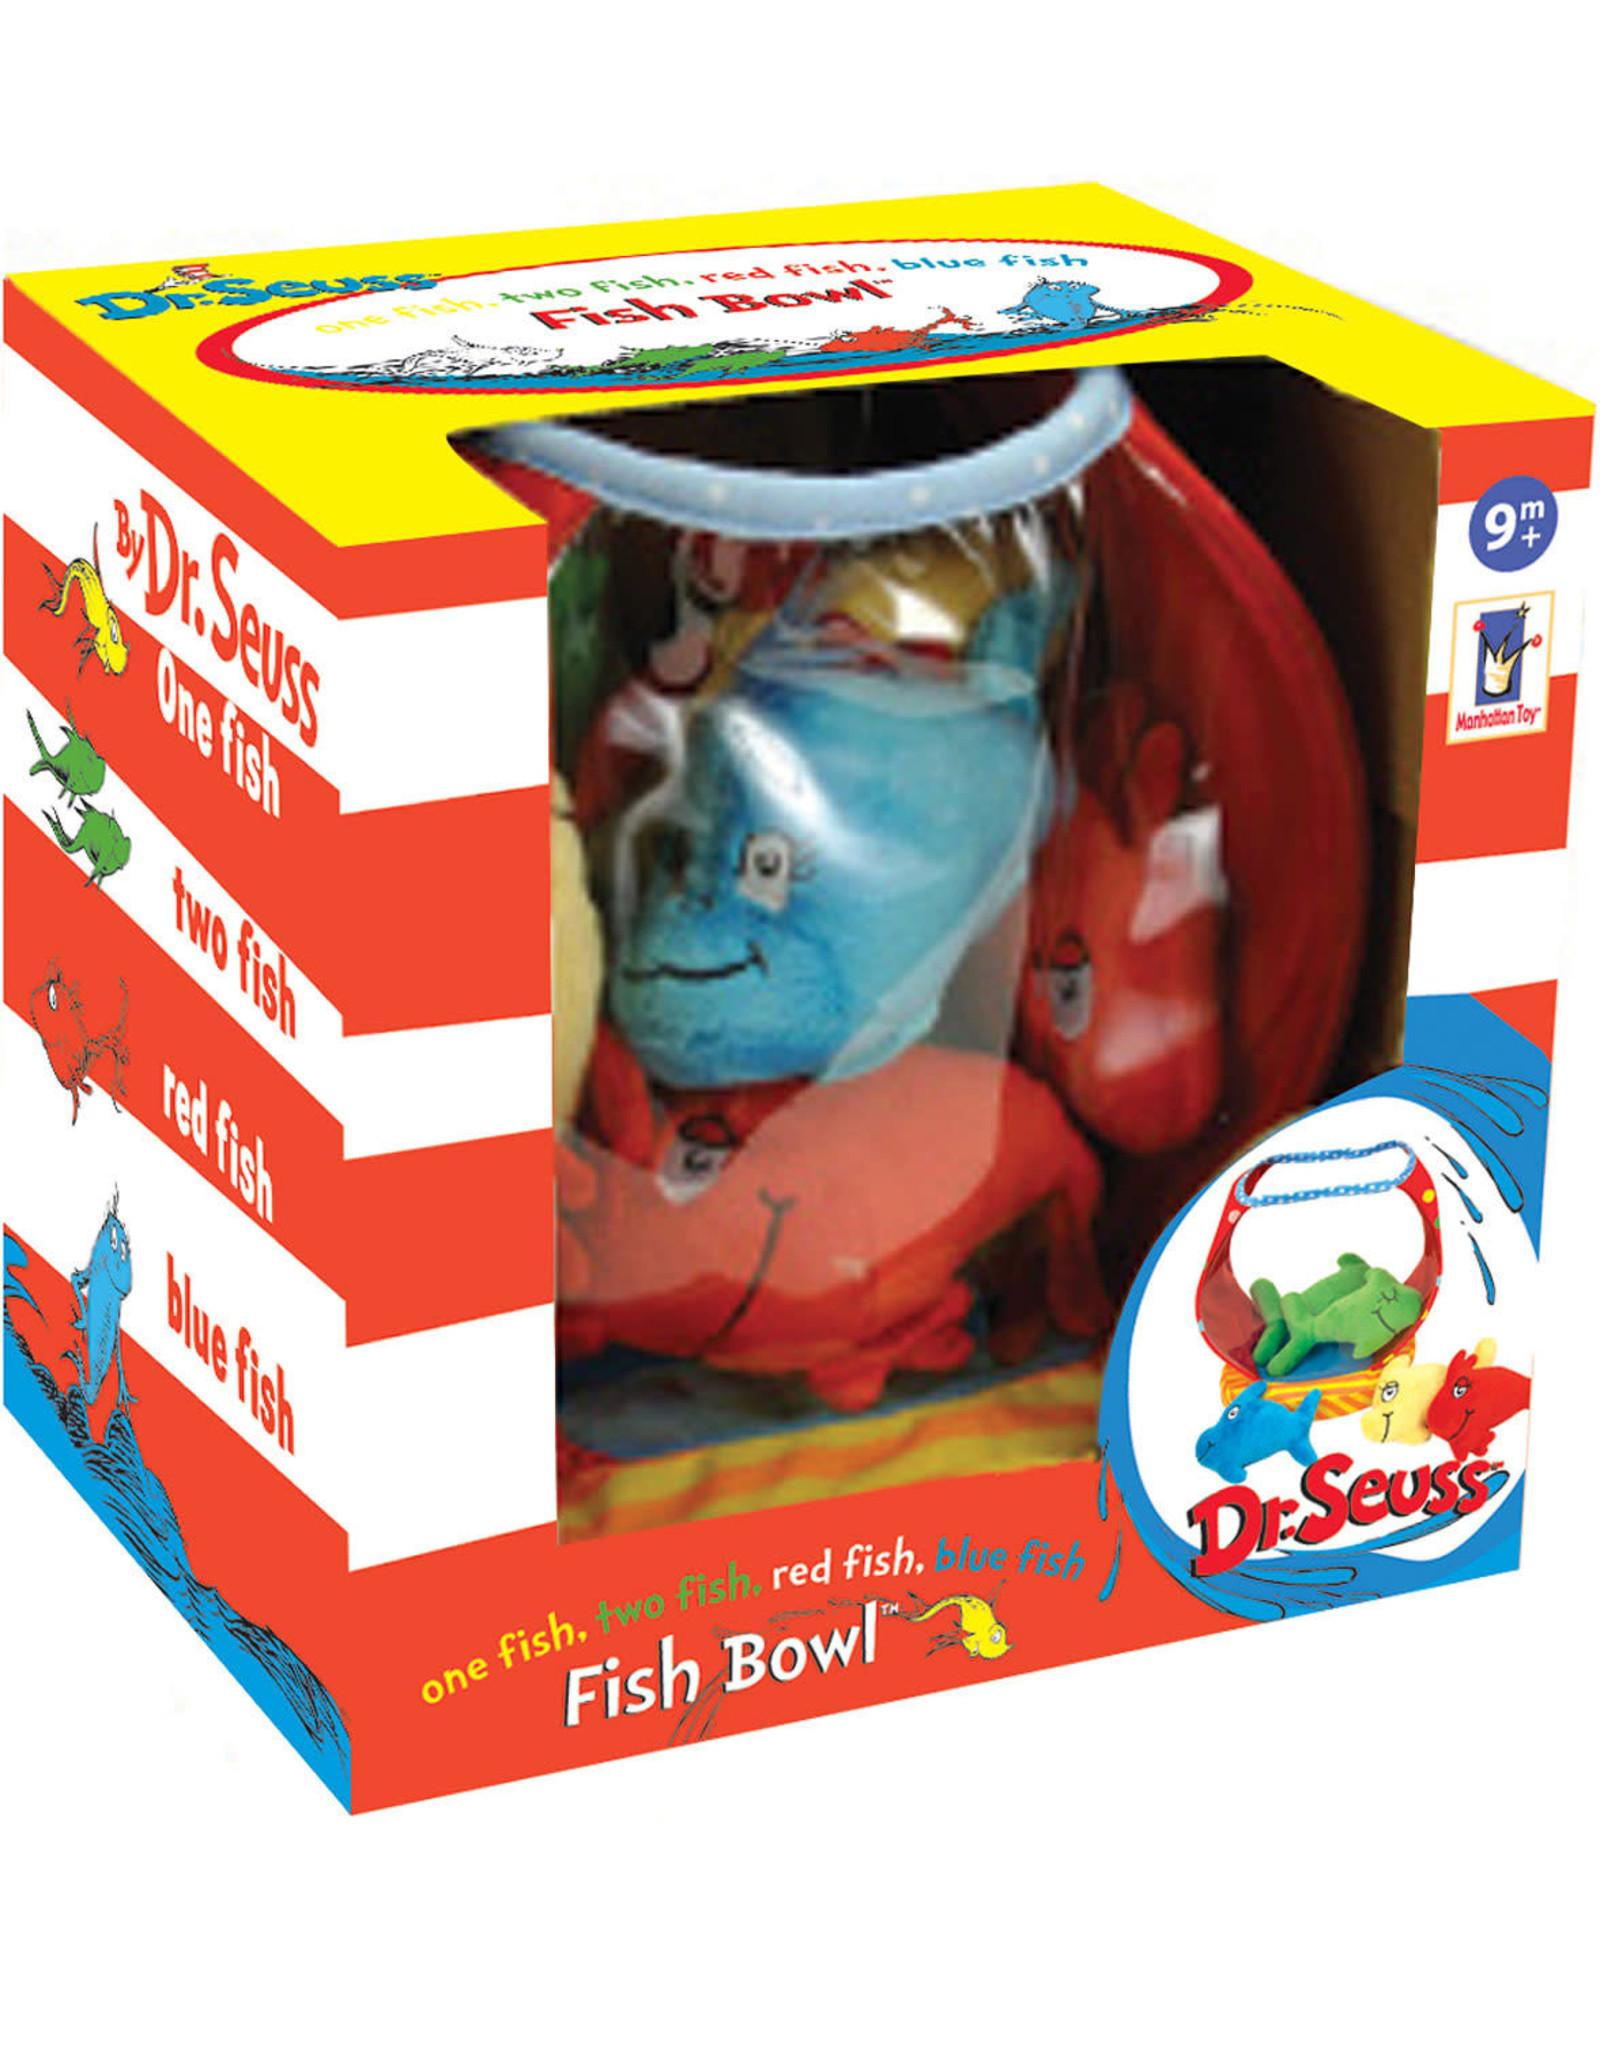 Dr Seuss Dr. Seuss ONE FISH Fishbowl